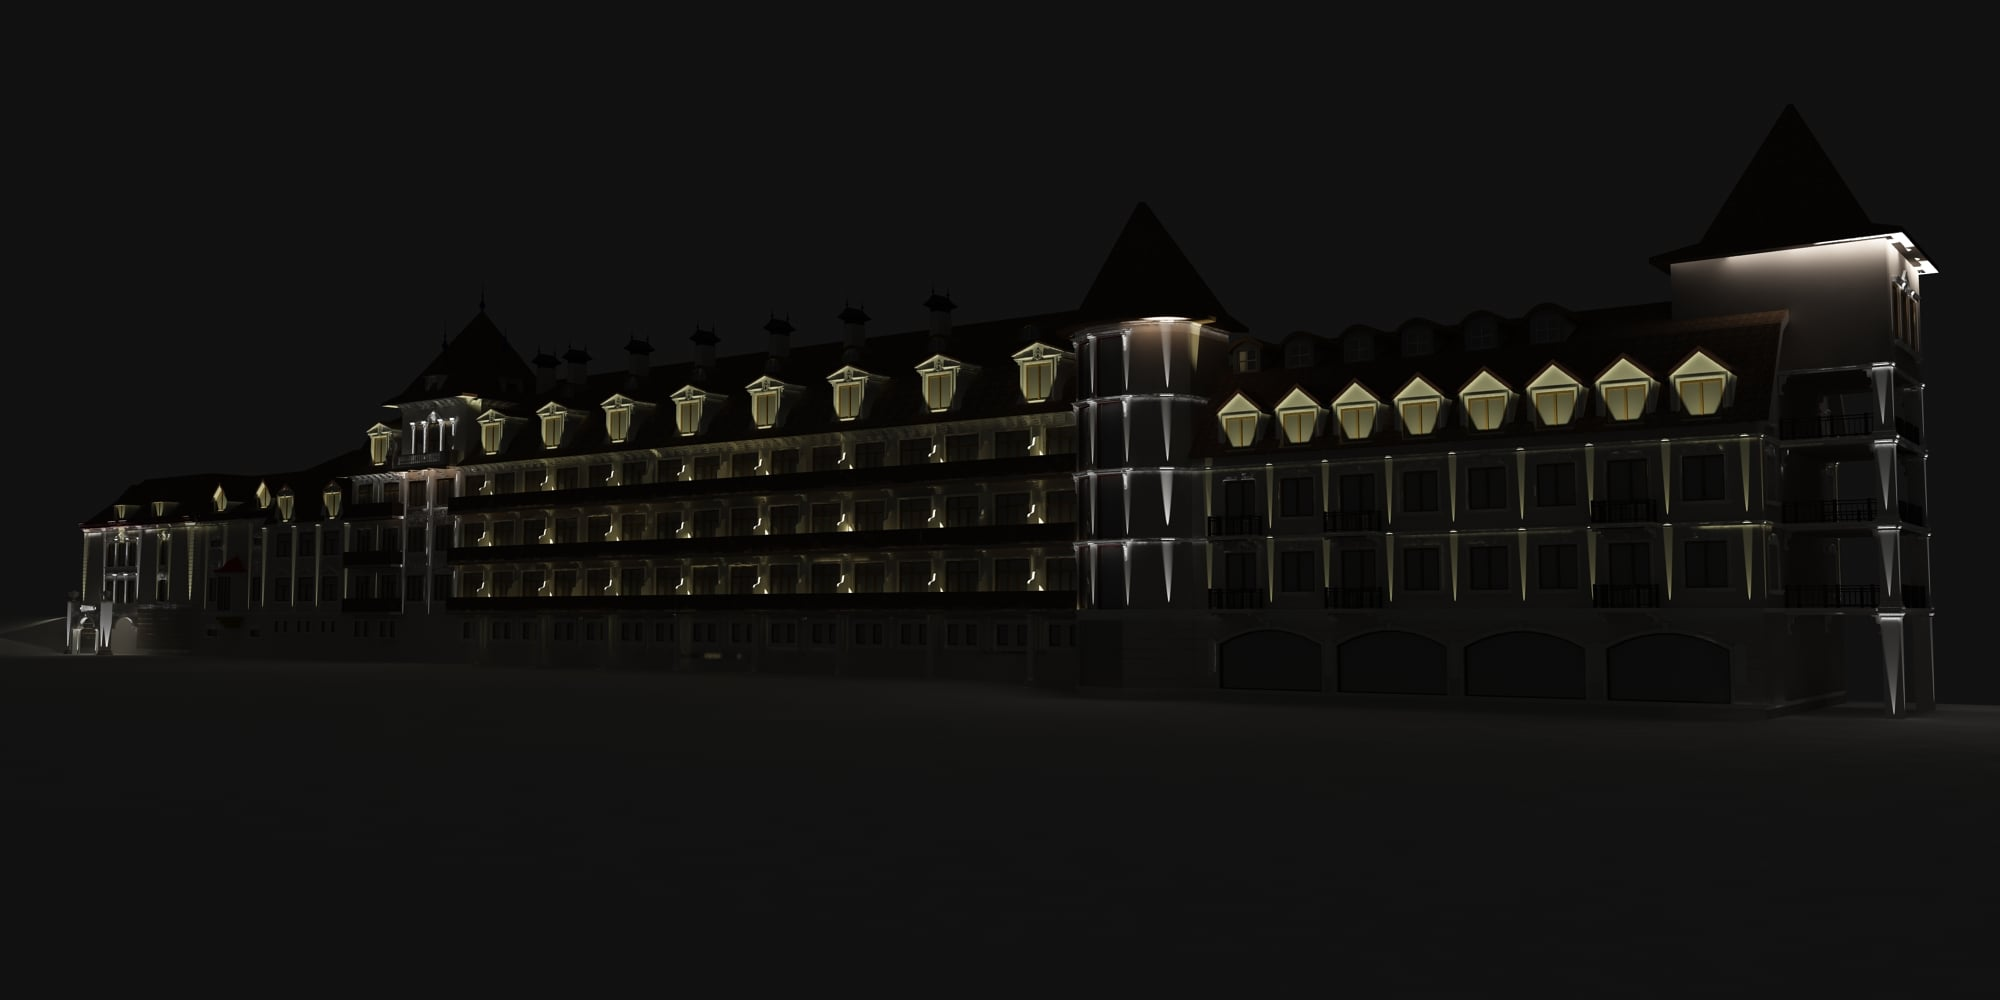 Архітектурне освітлення Edem Resort(макет)